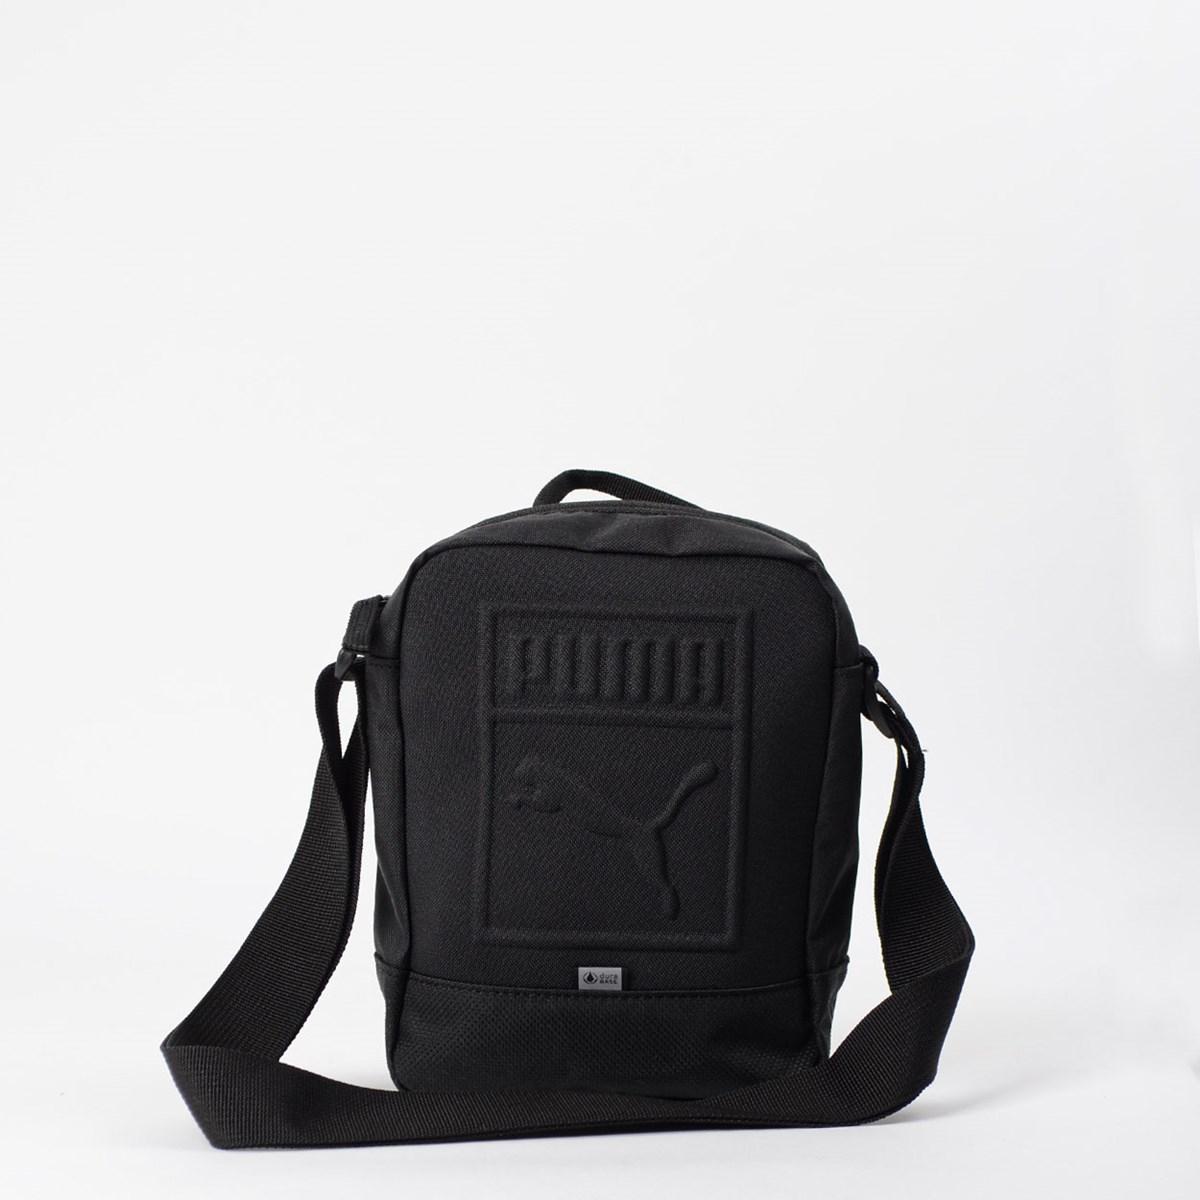 Bolsa Puma S Portable Black 07558201